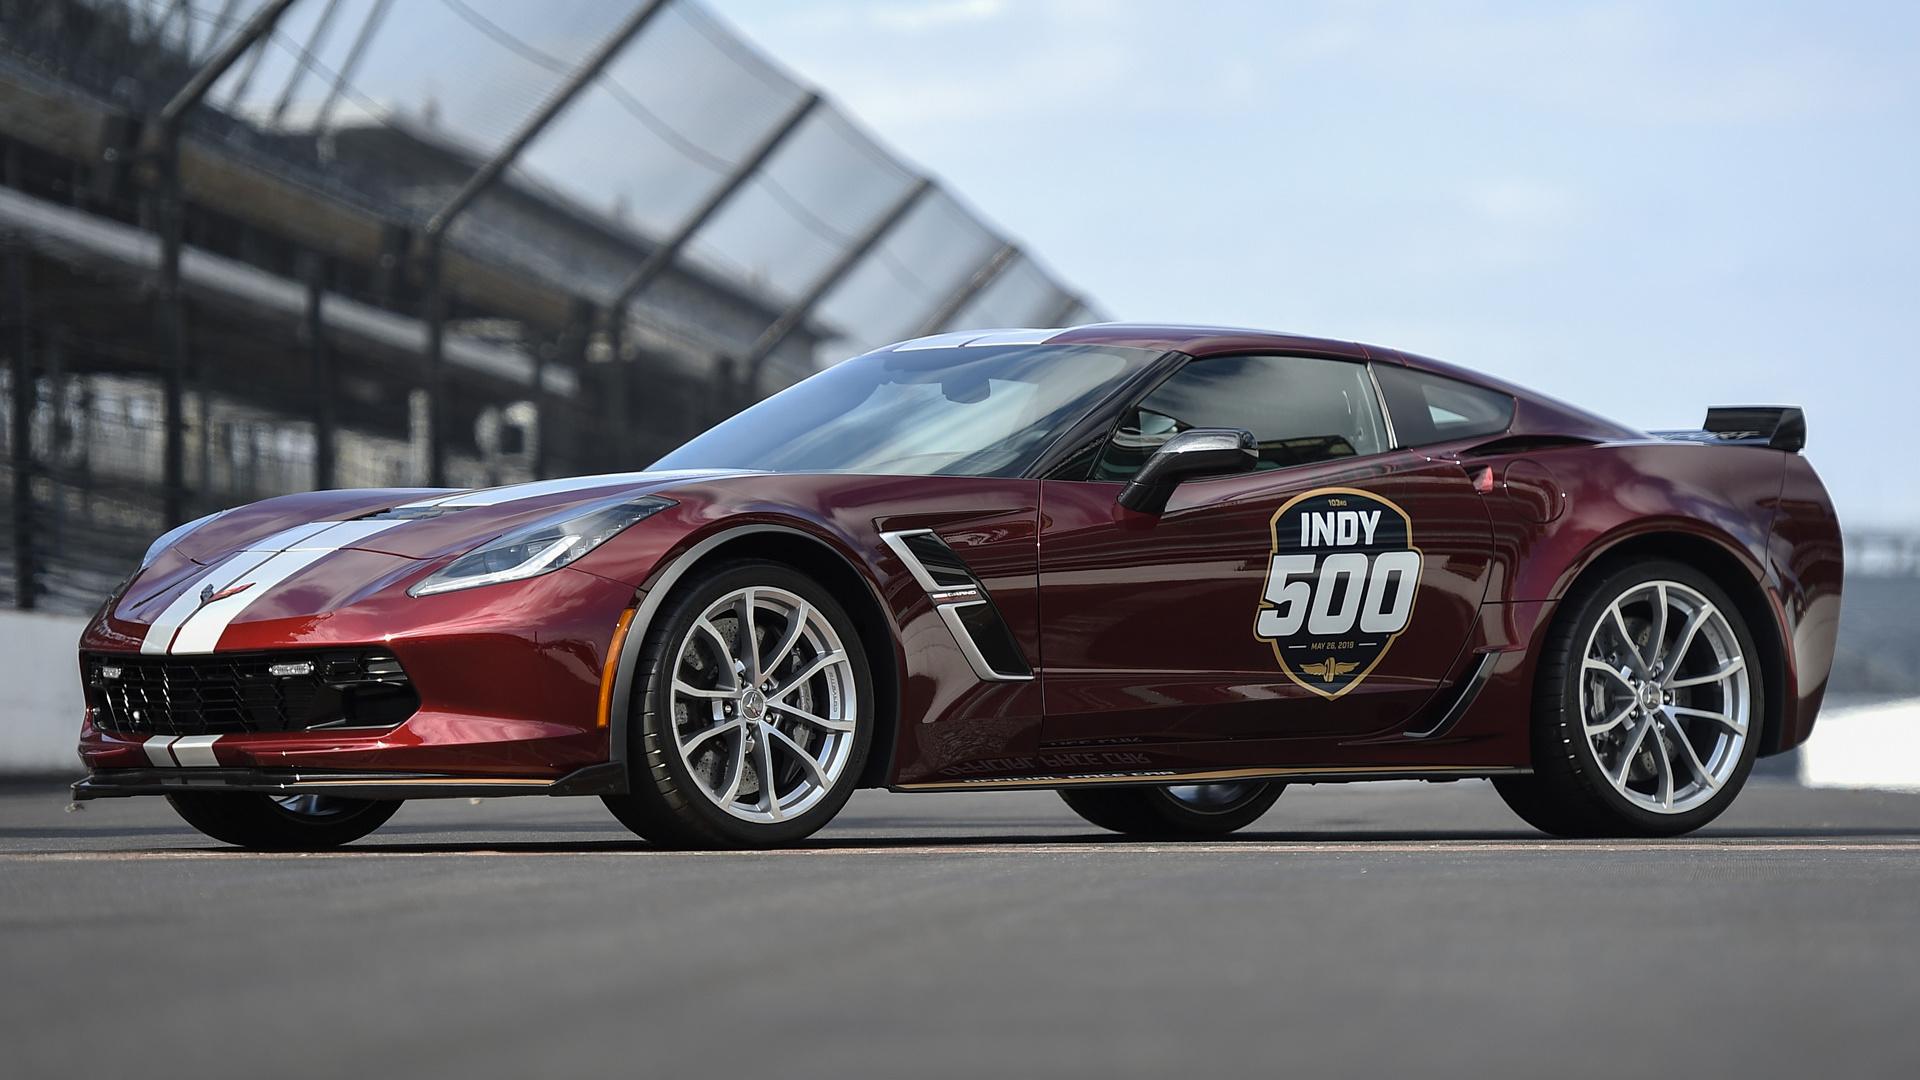 2019 Chevrolet Corvette Grand Sport Indy 500 Pace Car   Wallpapers 1920x1080